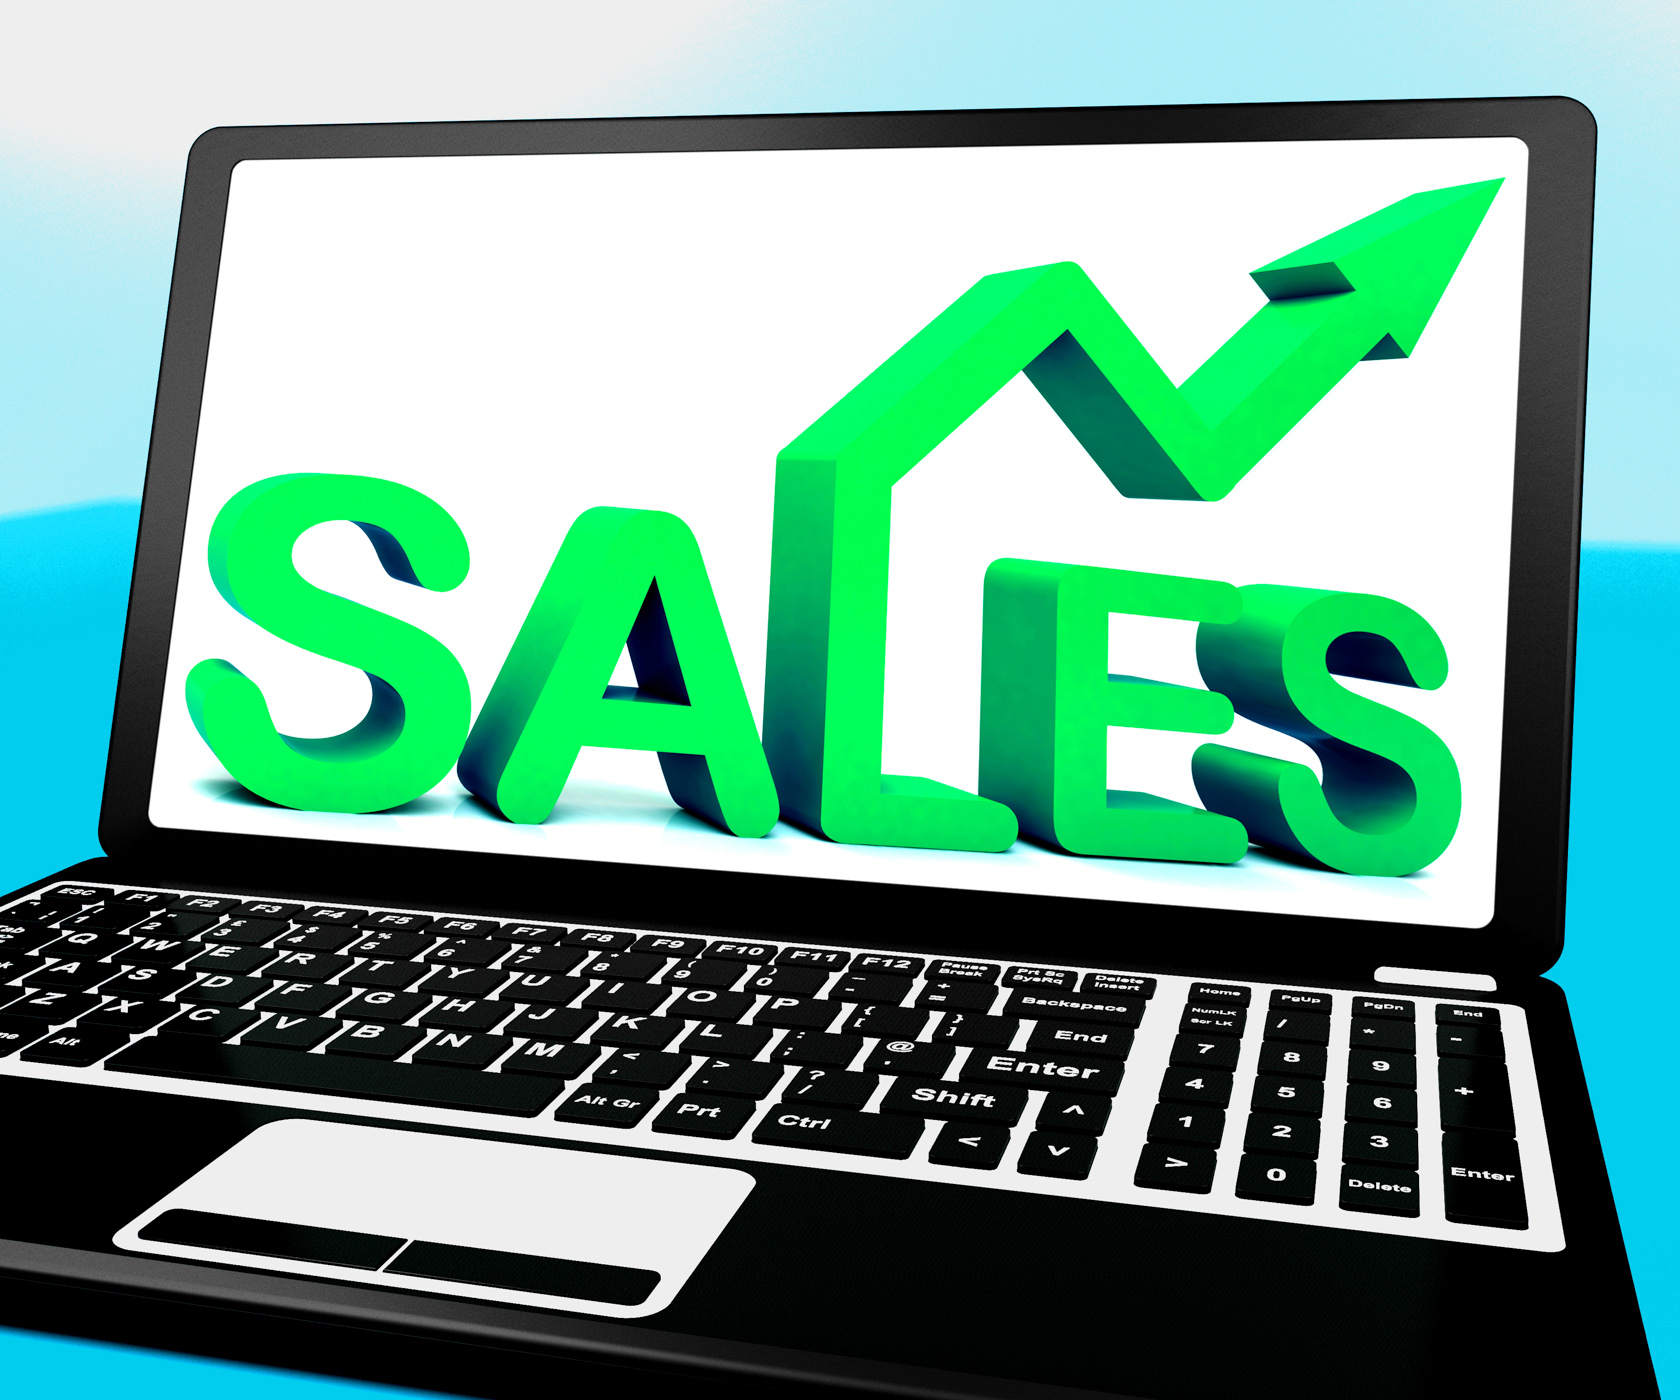 Sales on notebook showing marketing profits photo